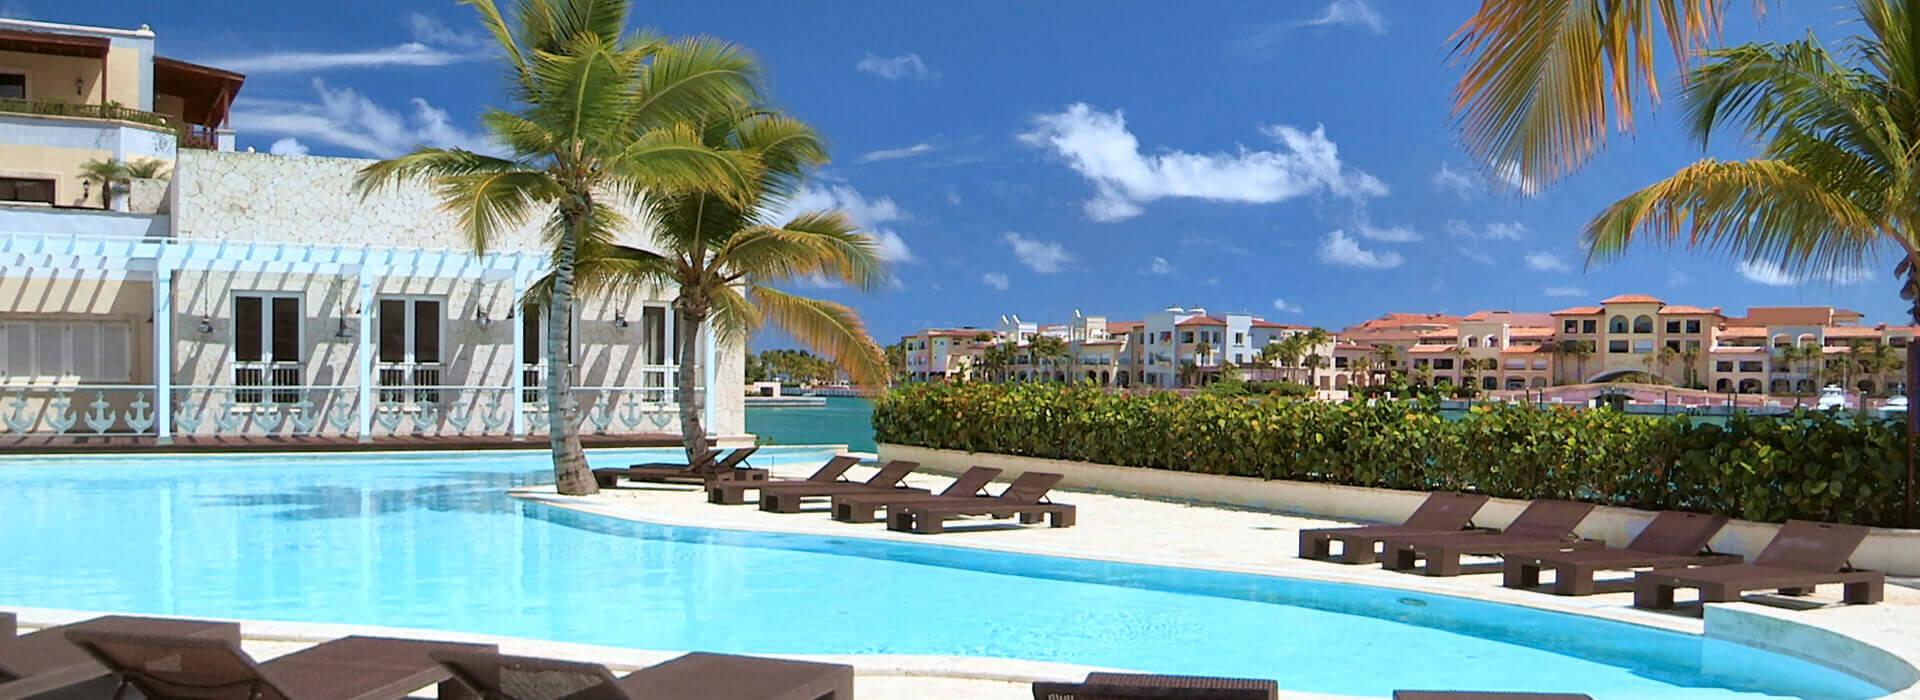 punta cana best resort